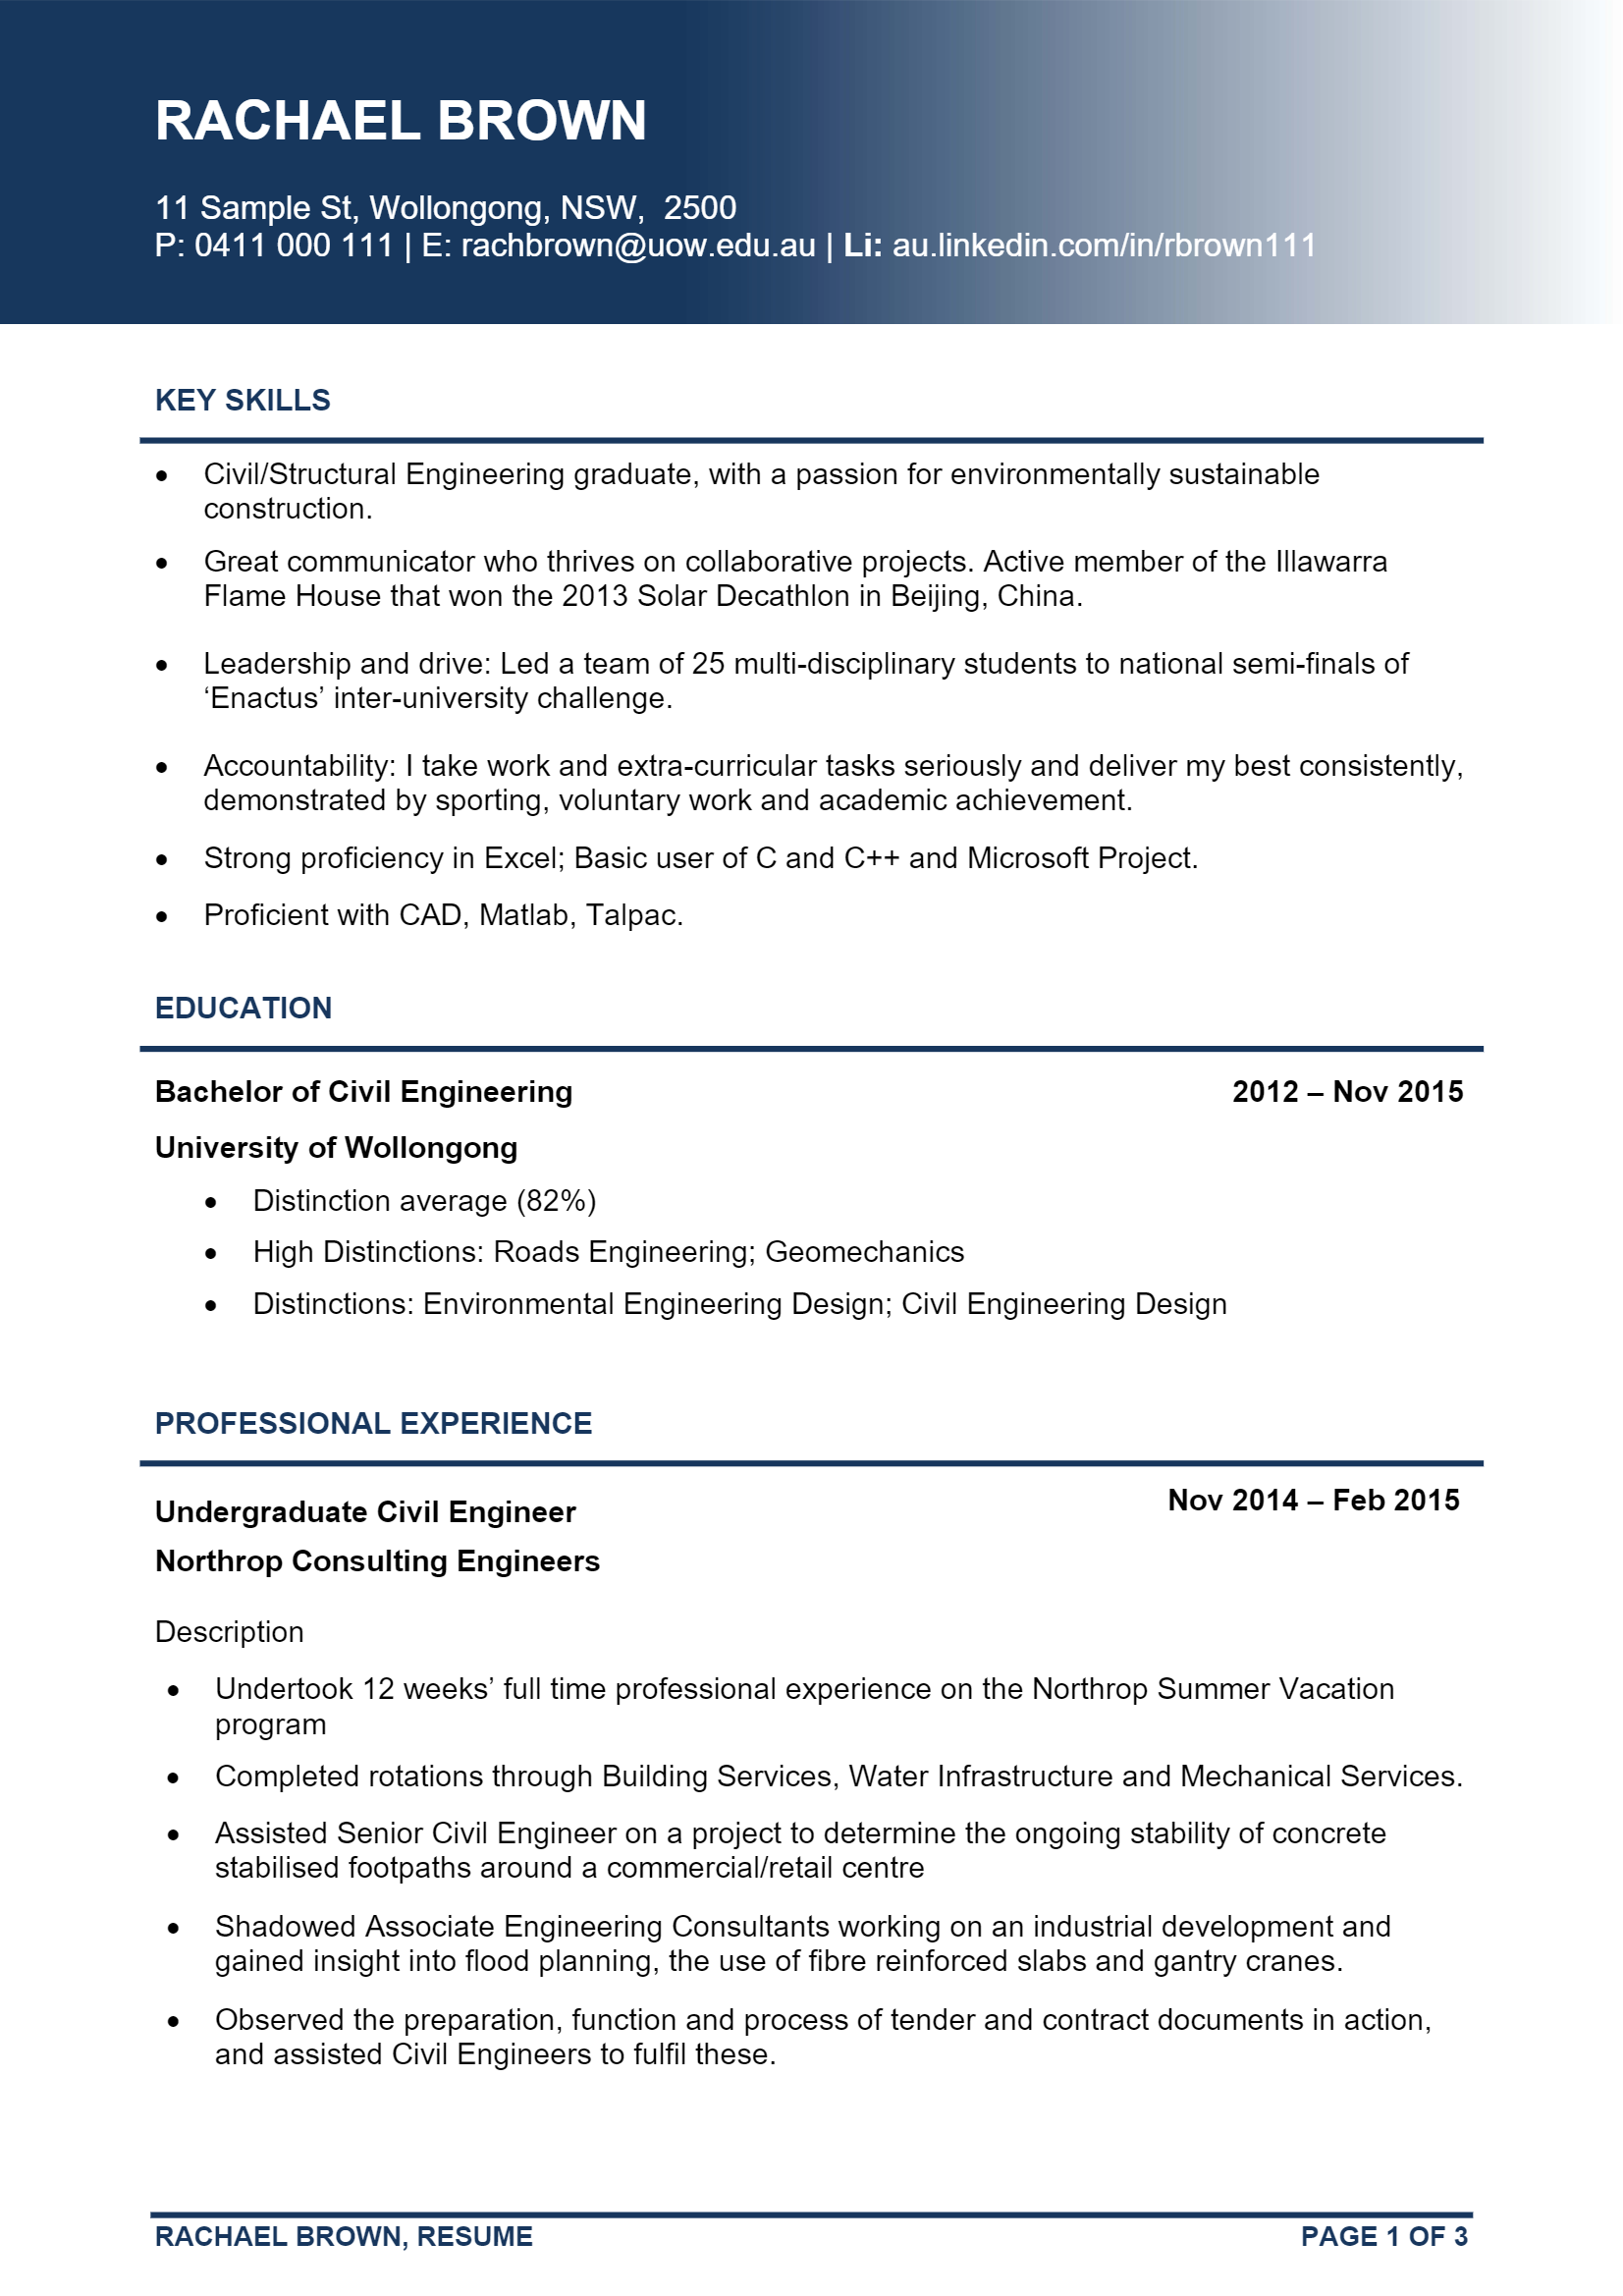 Civil Engineer > Civil Engineer .Docx (Word)